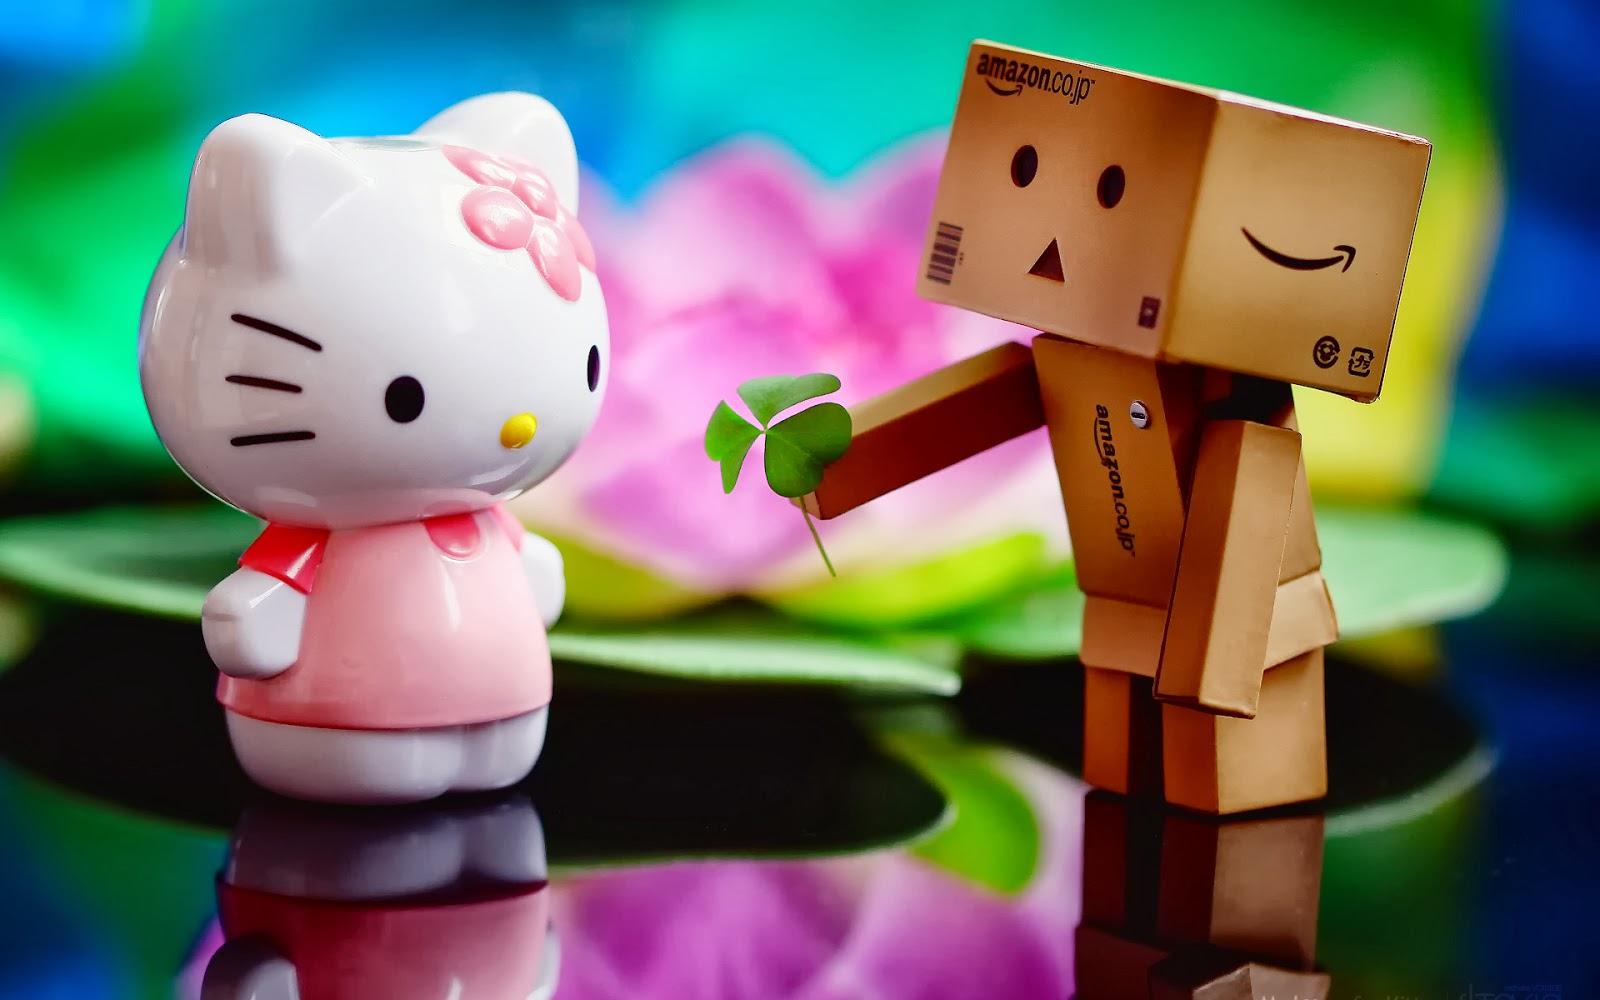 "<img src=""http://2.bp.blogspot.com/-HJPzeyNbWV4/UufTL7czEDI/AAAAAAAAKiE/ICpUVBFegcs/s1600/love-you-kitty-wallpaper.jpg"" alt=""i love you kitty wallpaper"" />"